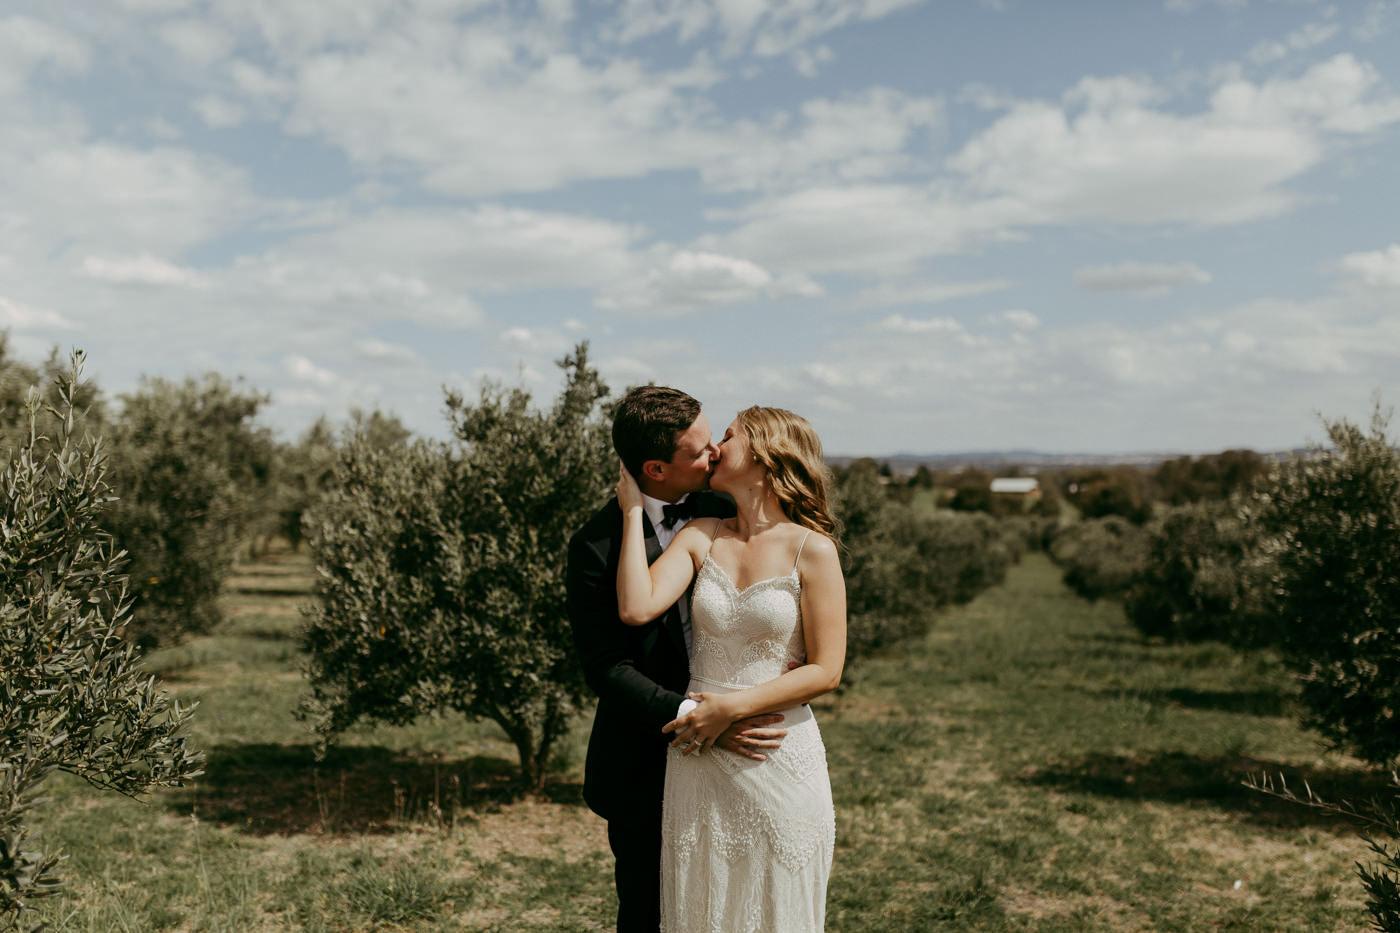 Anthony & Eliet - Wagga Wagga Wedding - Country NSW - Samantha Heather Photography-74.jpg